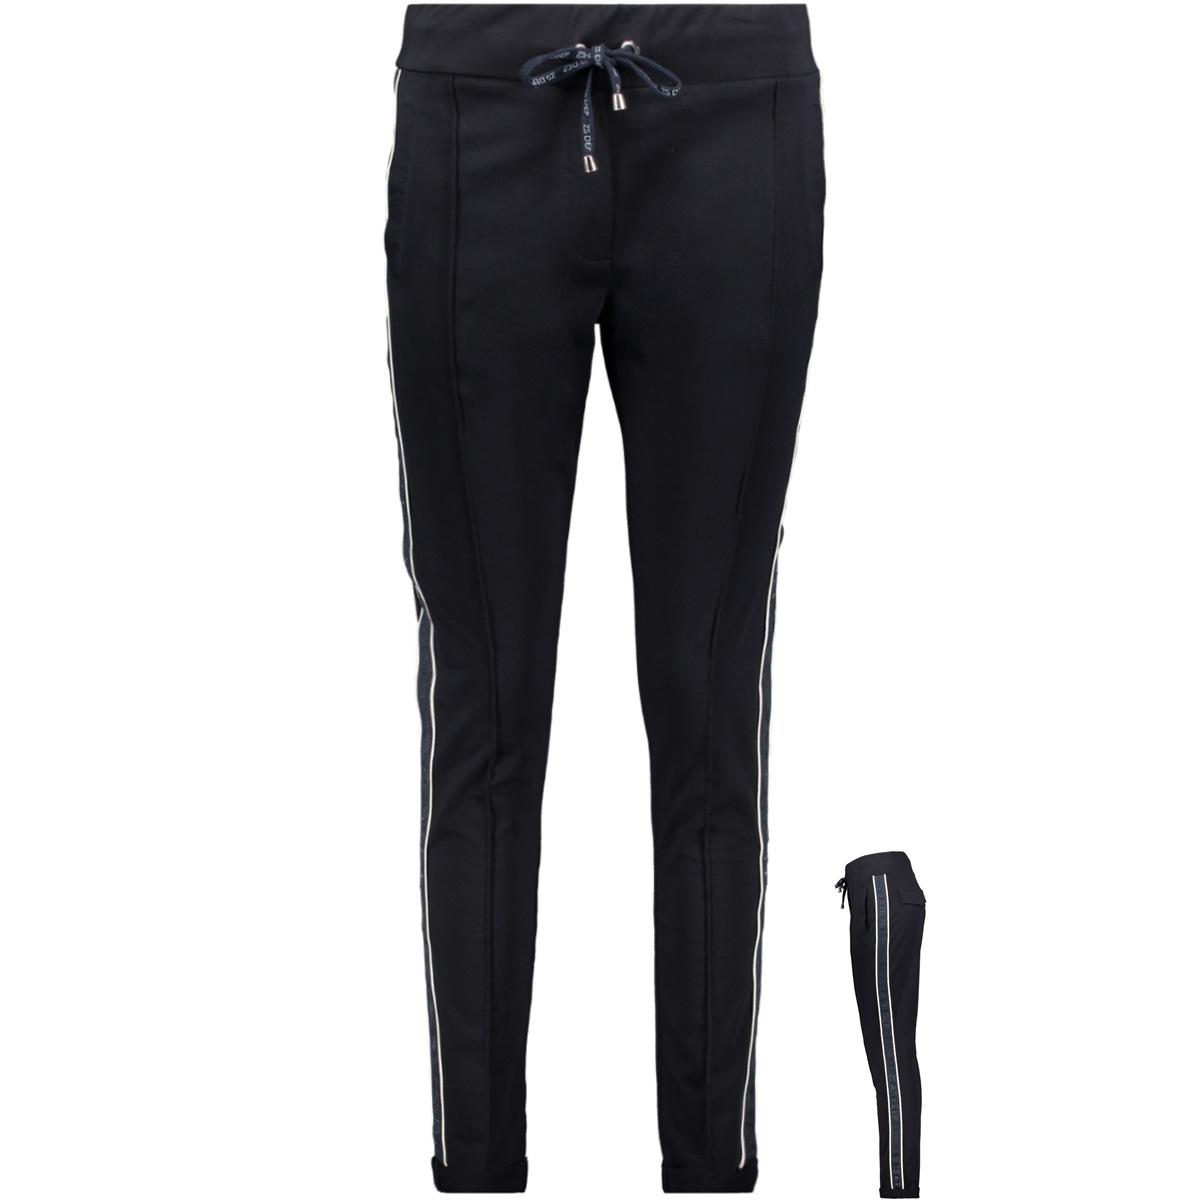 sweat trouser sr1916 zoso broek navy/offwhite